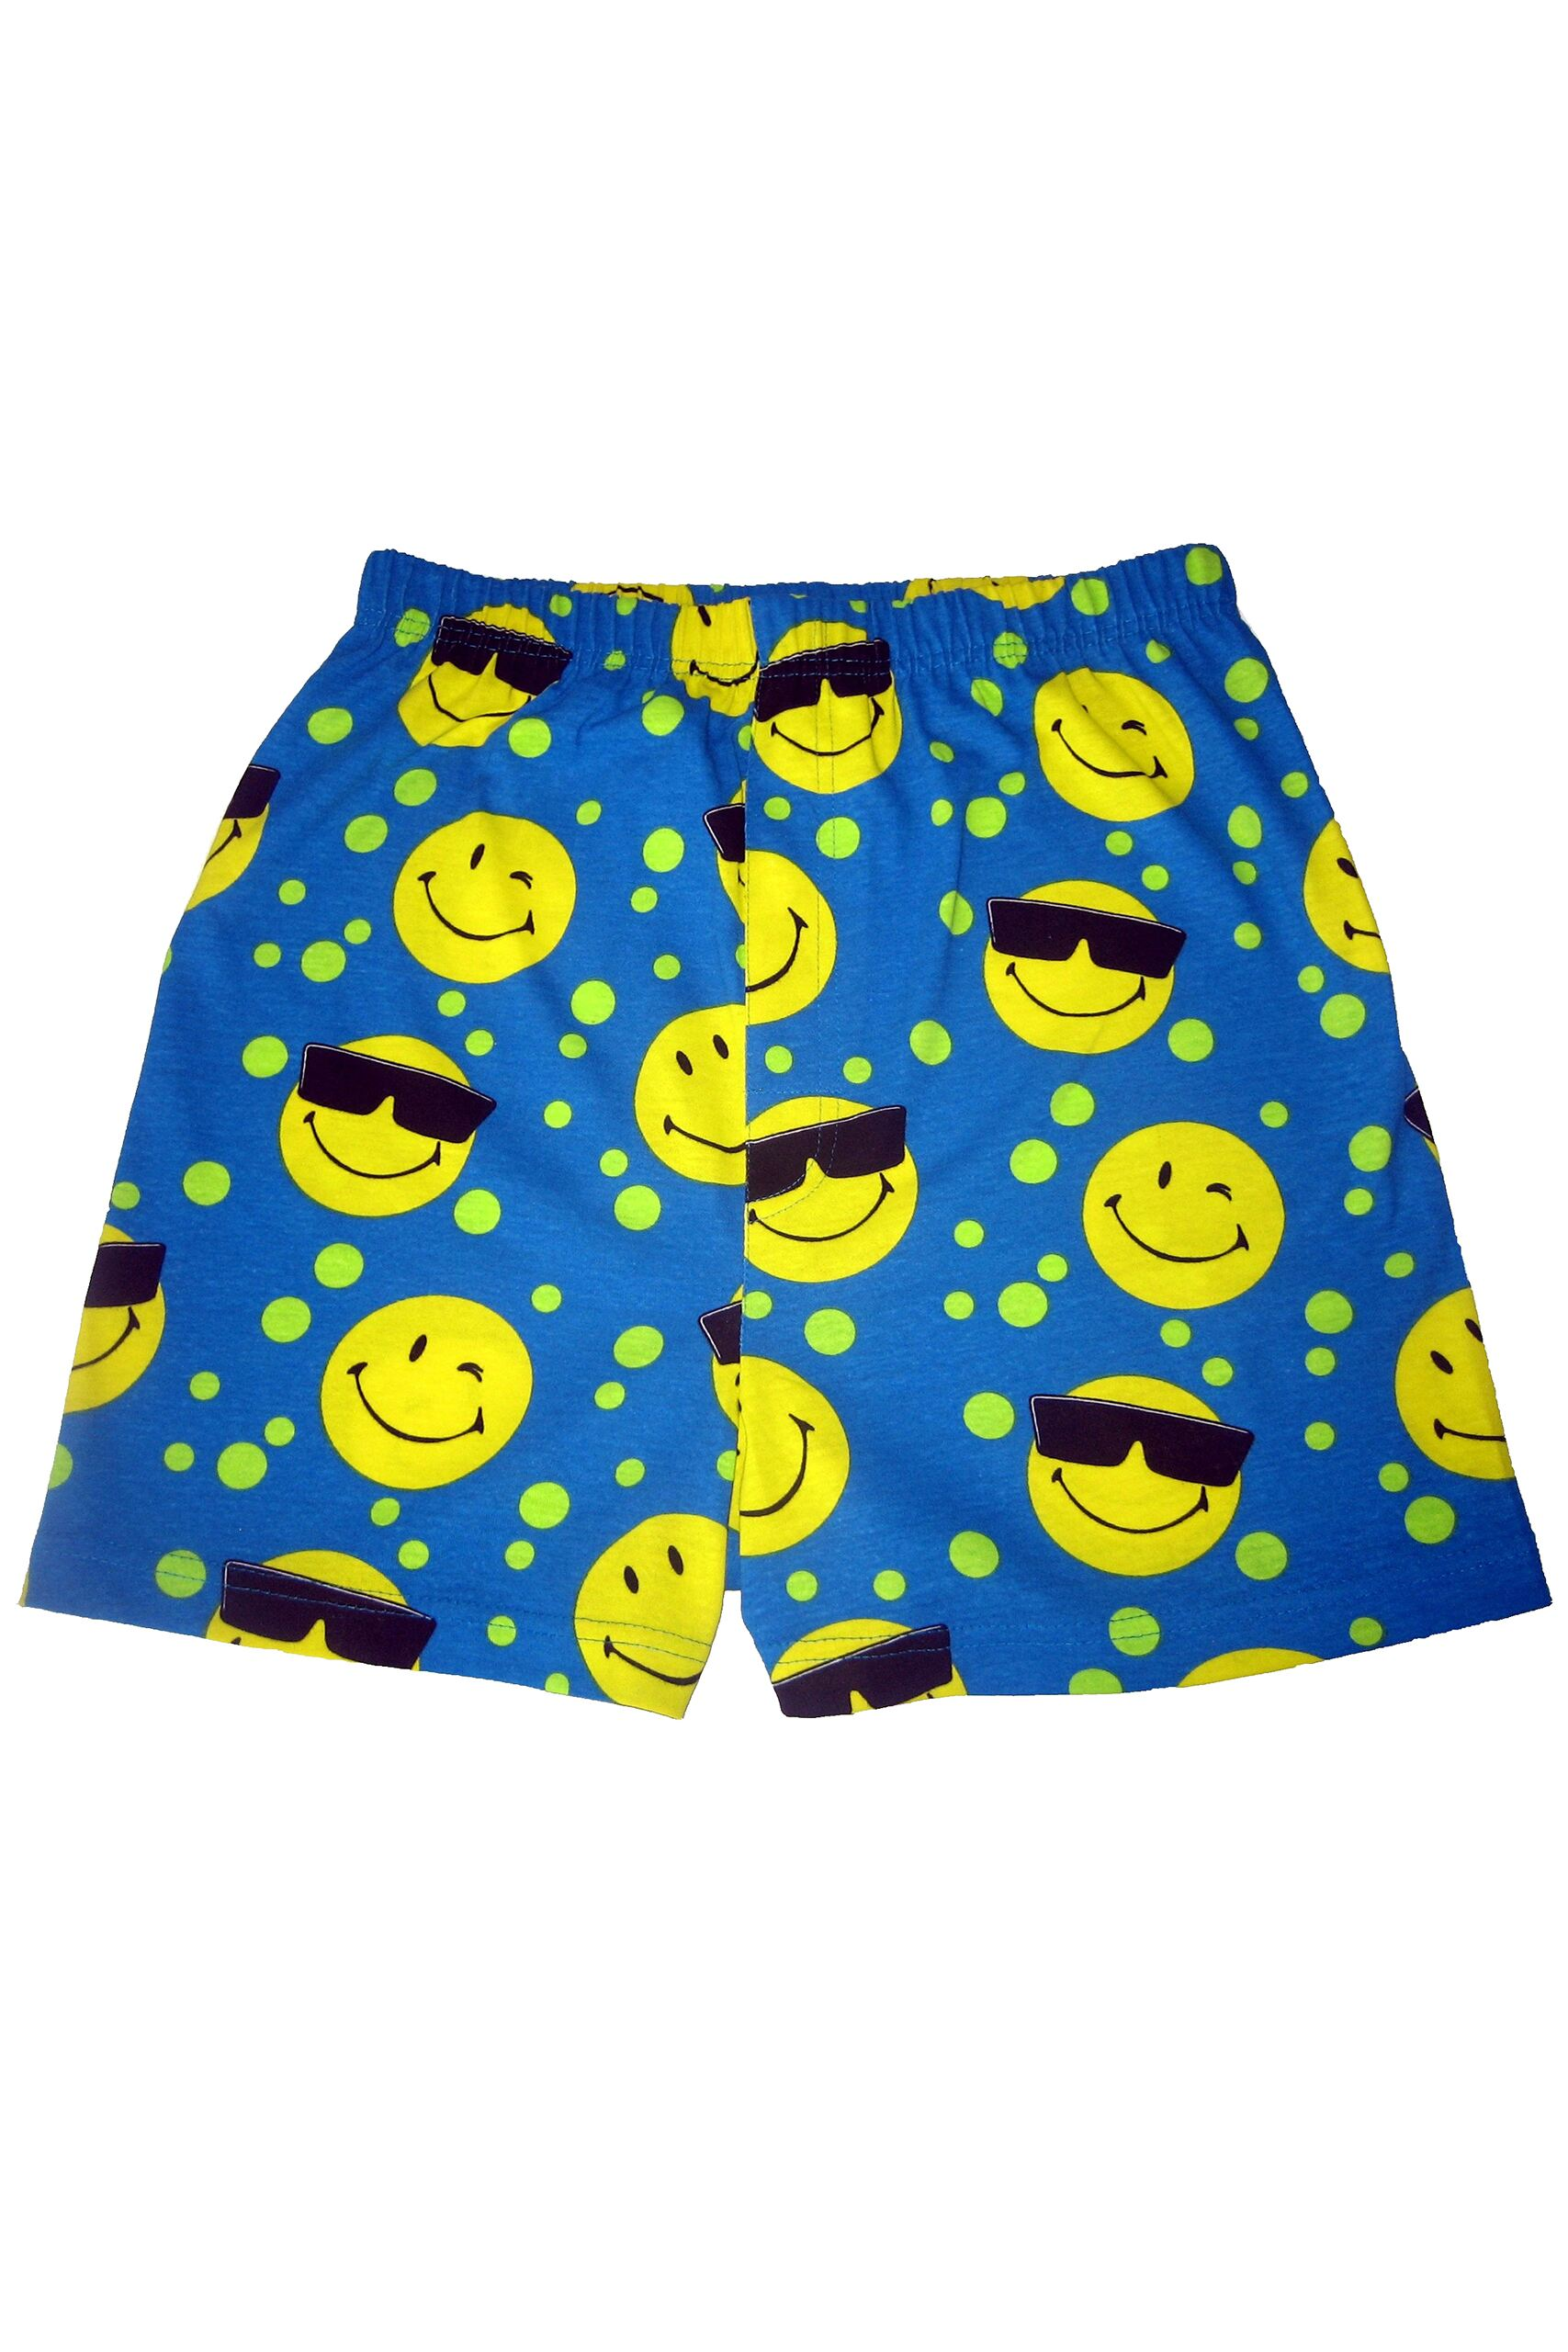 Image of 1 Pack Blue Magic Boxer Shorts In Smiley Pattern Men's Medium - SOCKSHOP